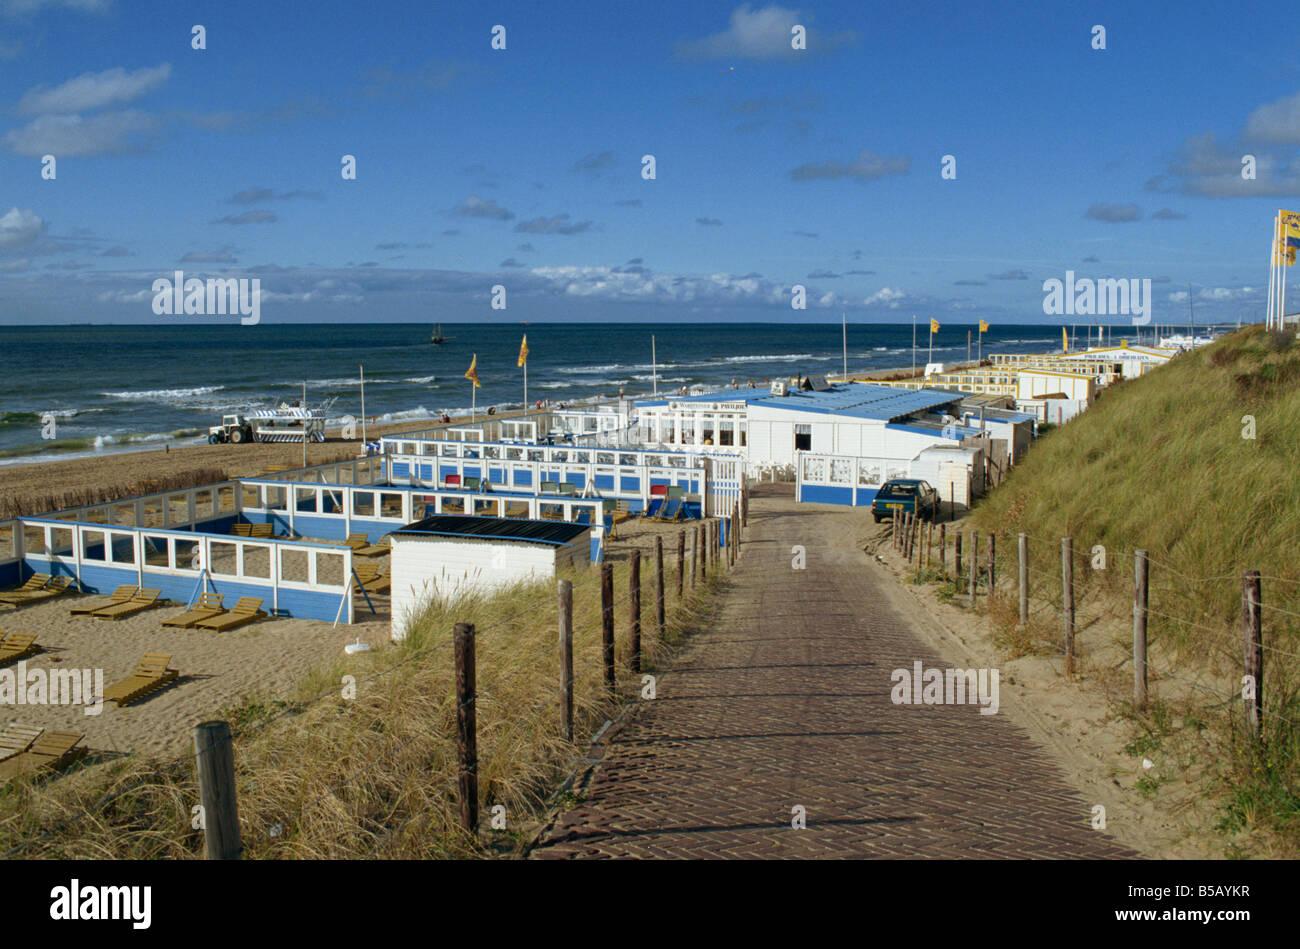 Beach wind breaks, North Sea resort of Zandvoort, Netherlands, Europe - Stock Image